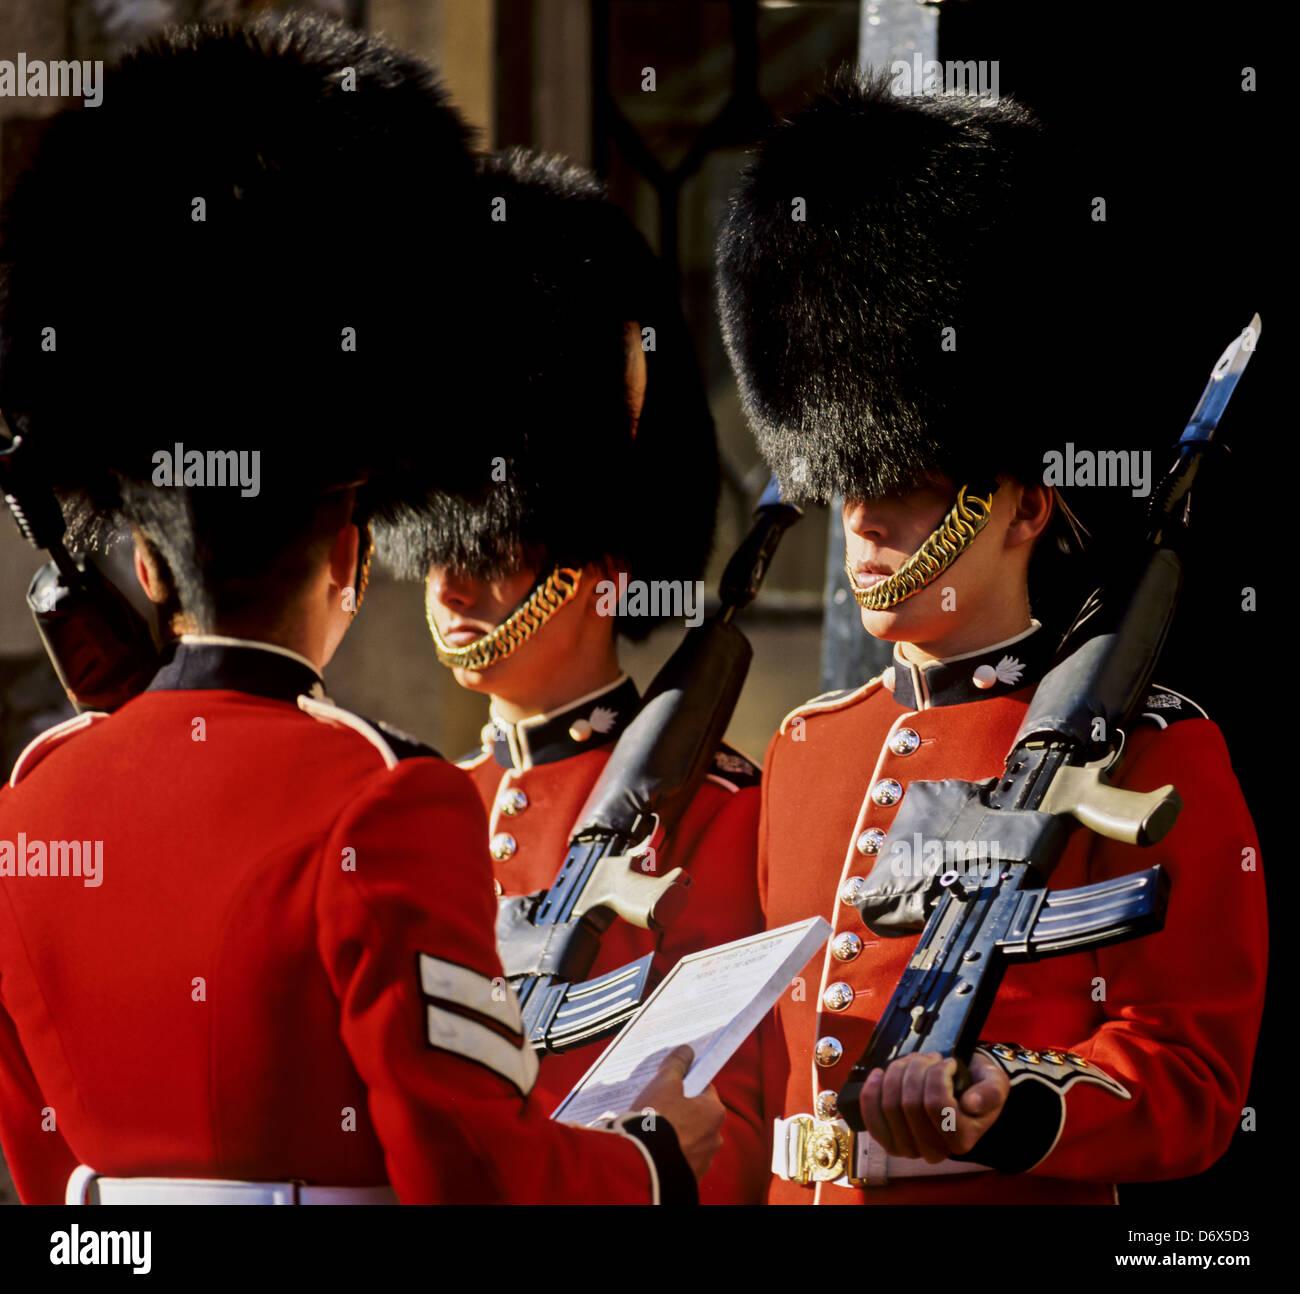 8557. Guardsmen, London, England, Europe - Stock Image